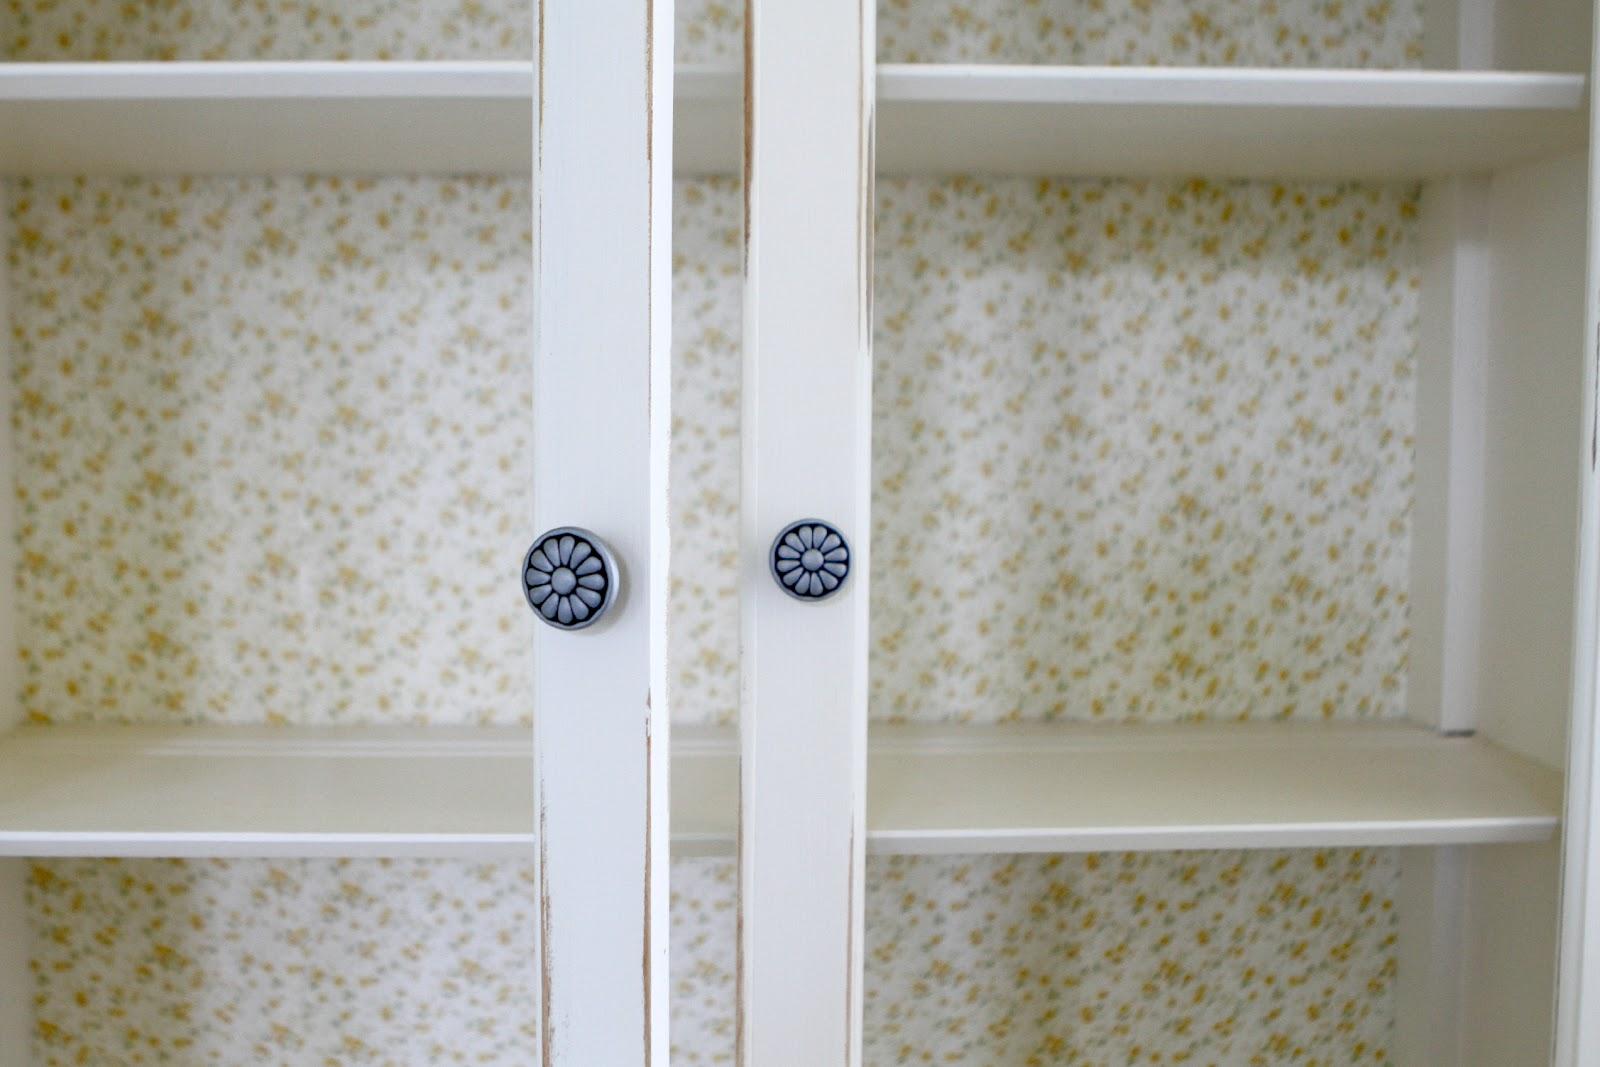 Zinsser wallpaper cover up wallpapersafari - Paintable wallpaper menards ...